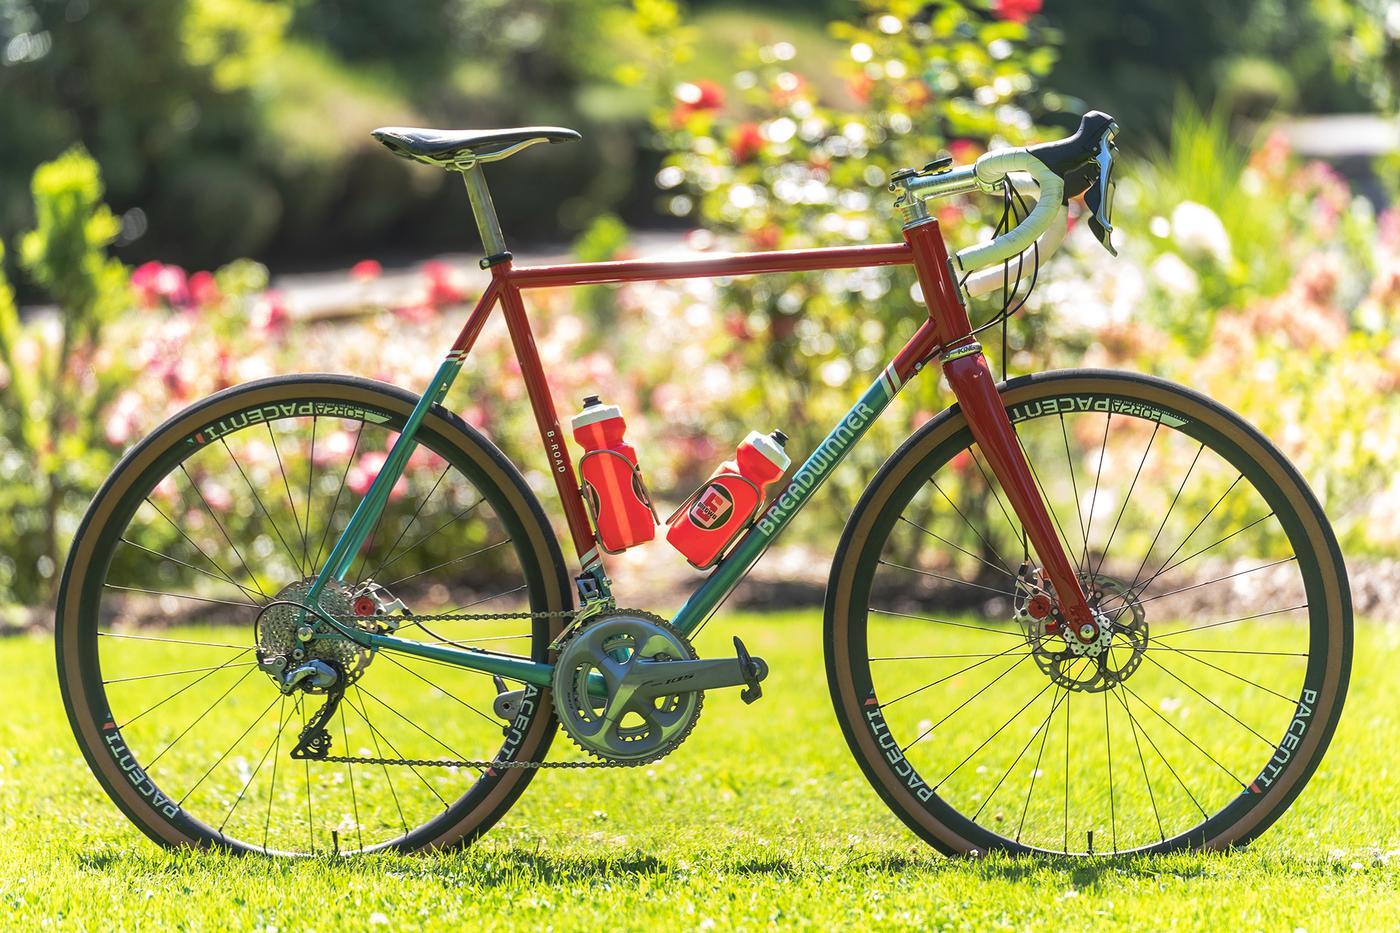 Readers' Rides: Hurl's 7 Eleven Inspired Breadwinner B-Road